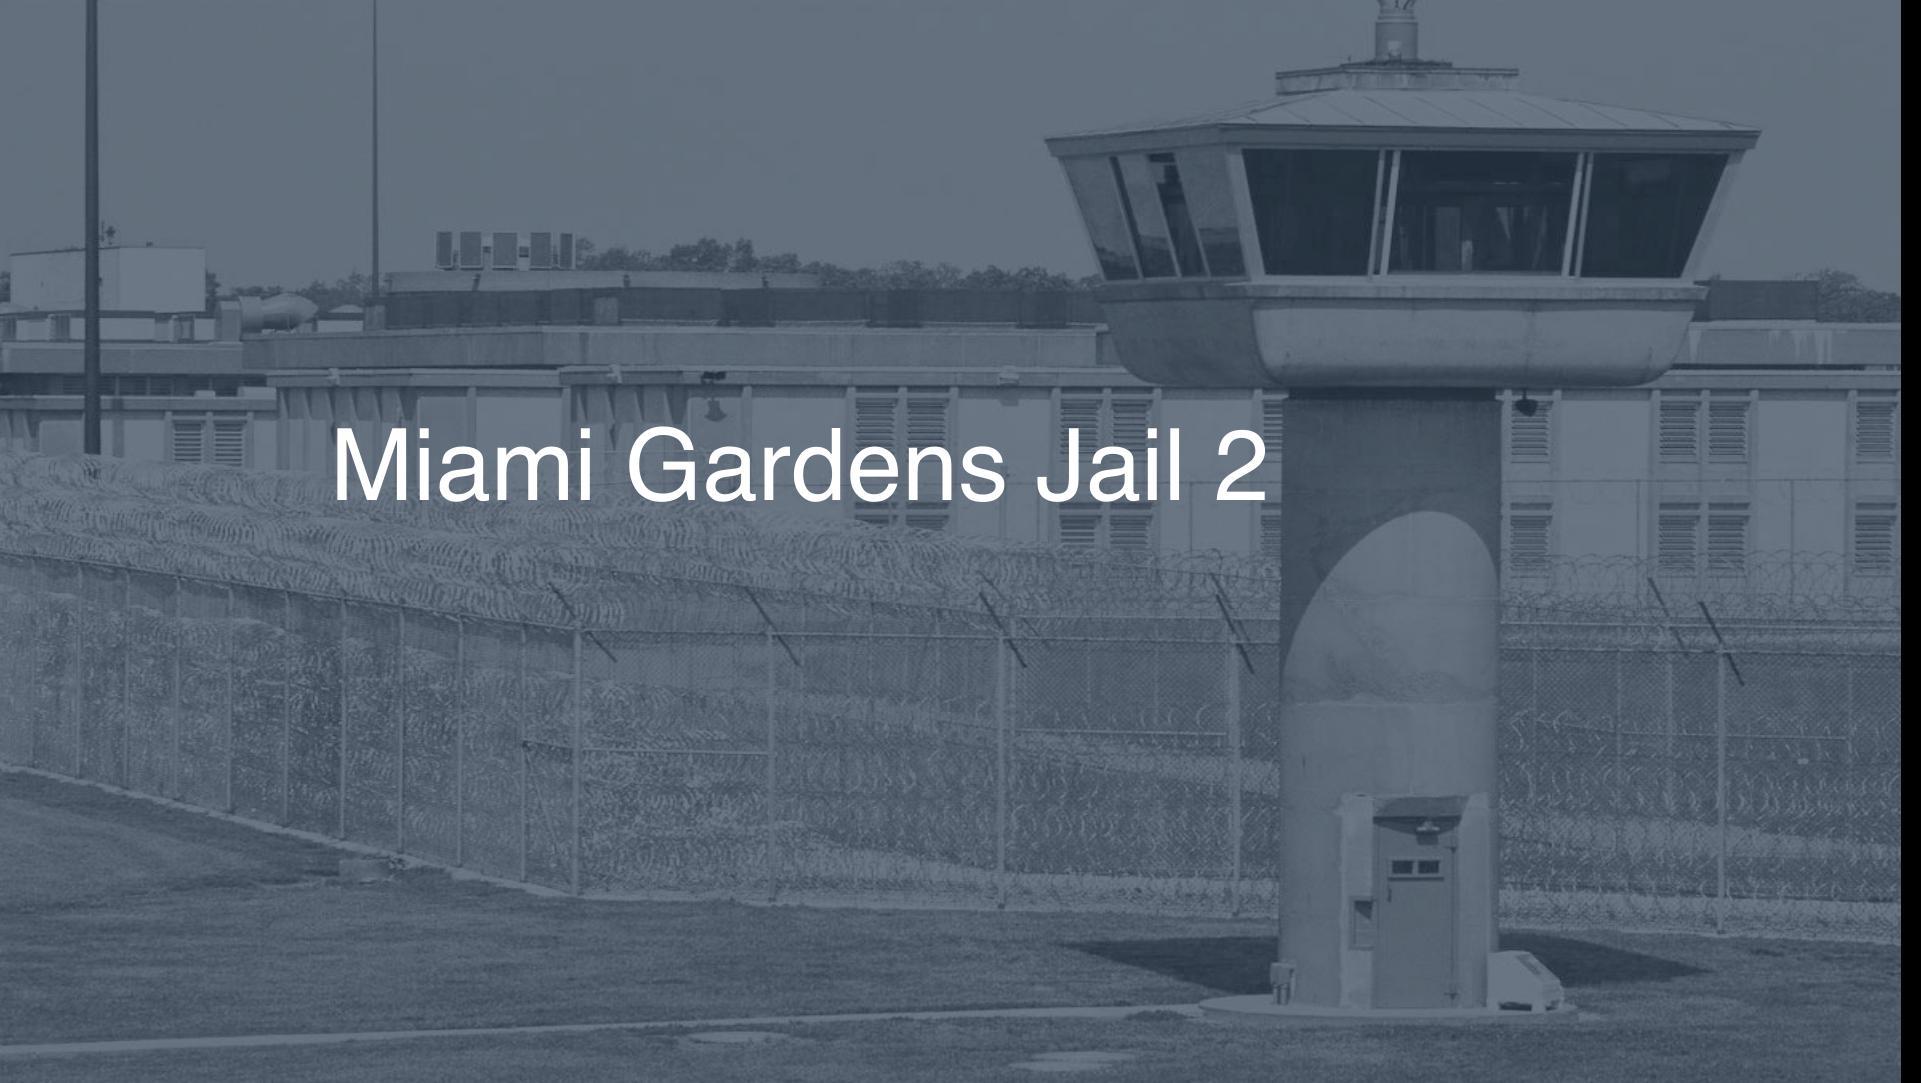 Miami Gardens Jail correctional facility picture